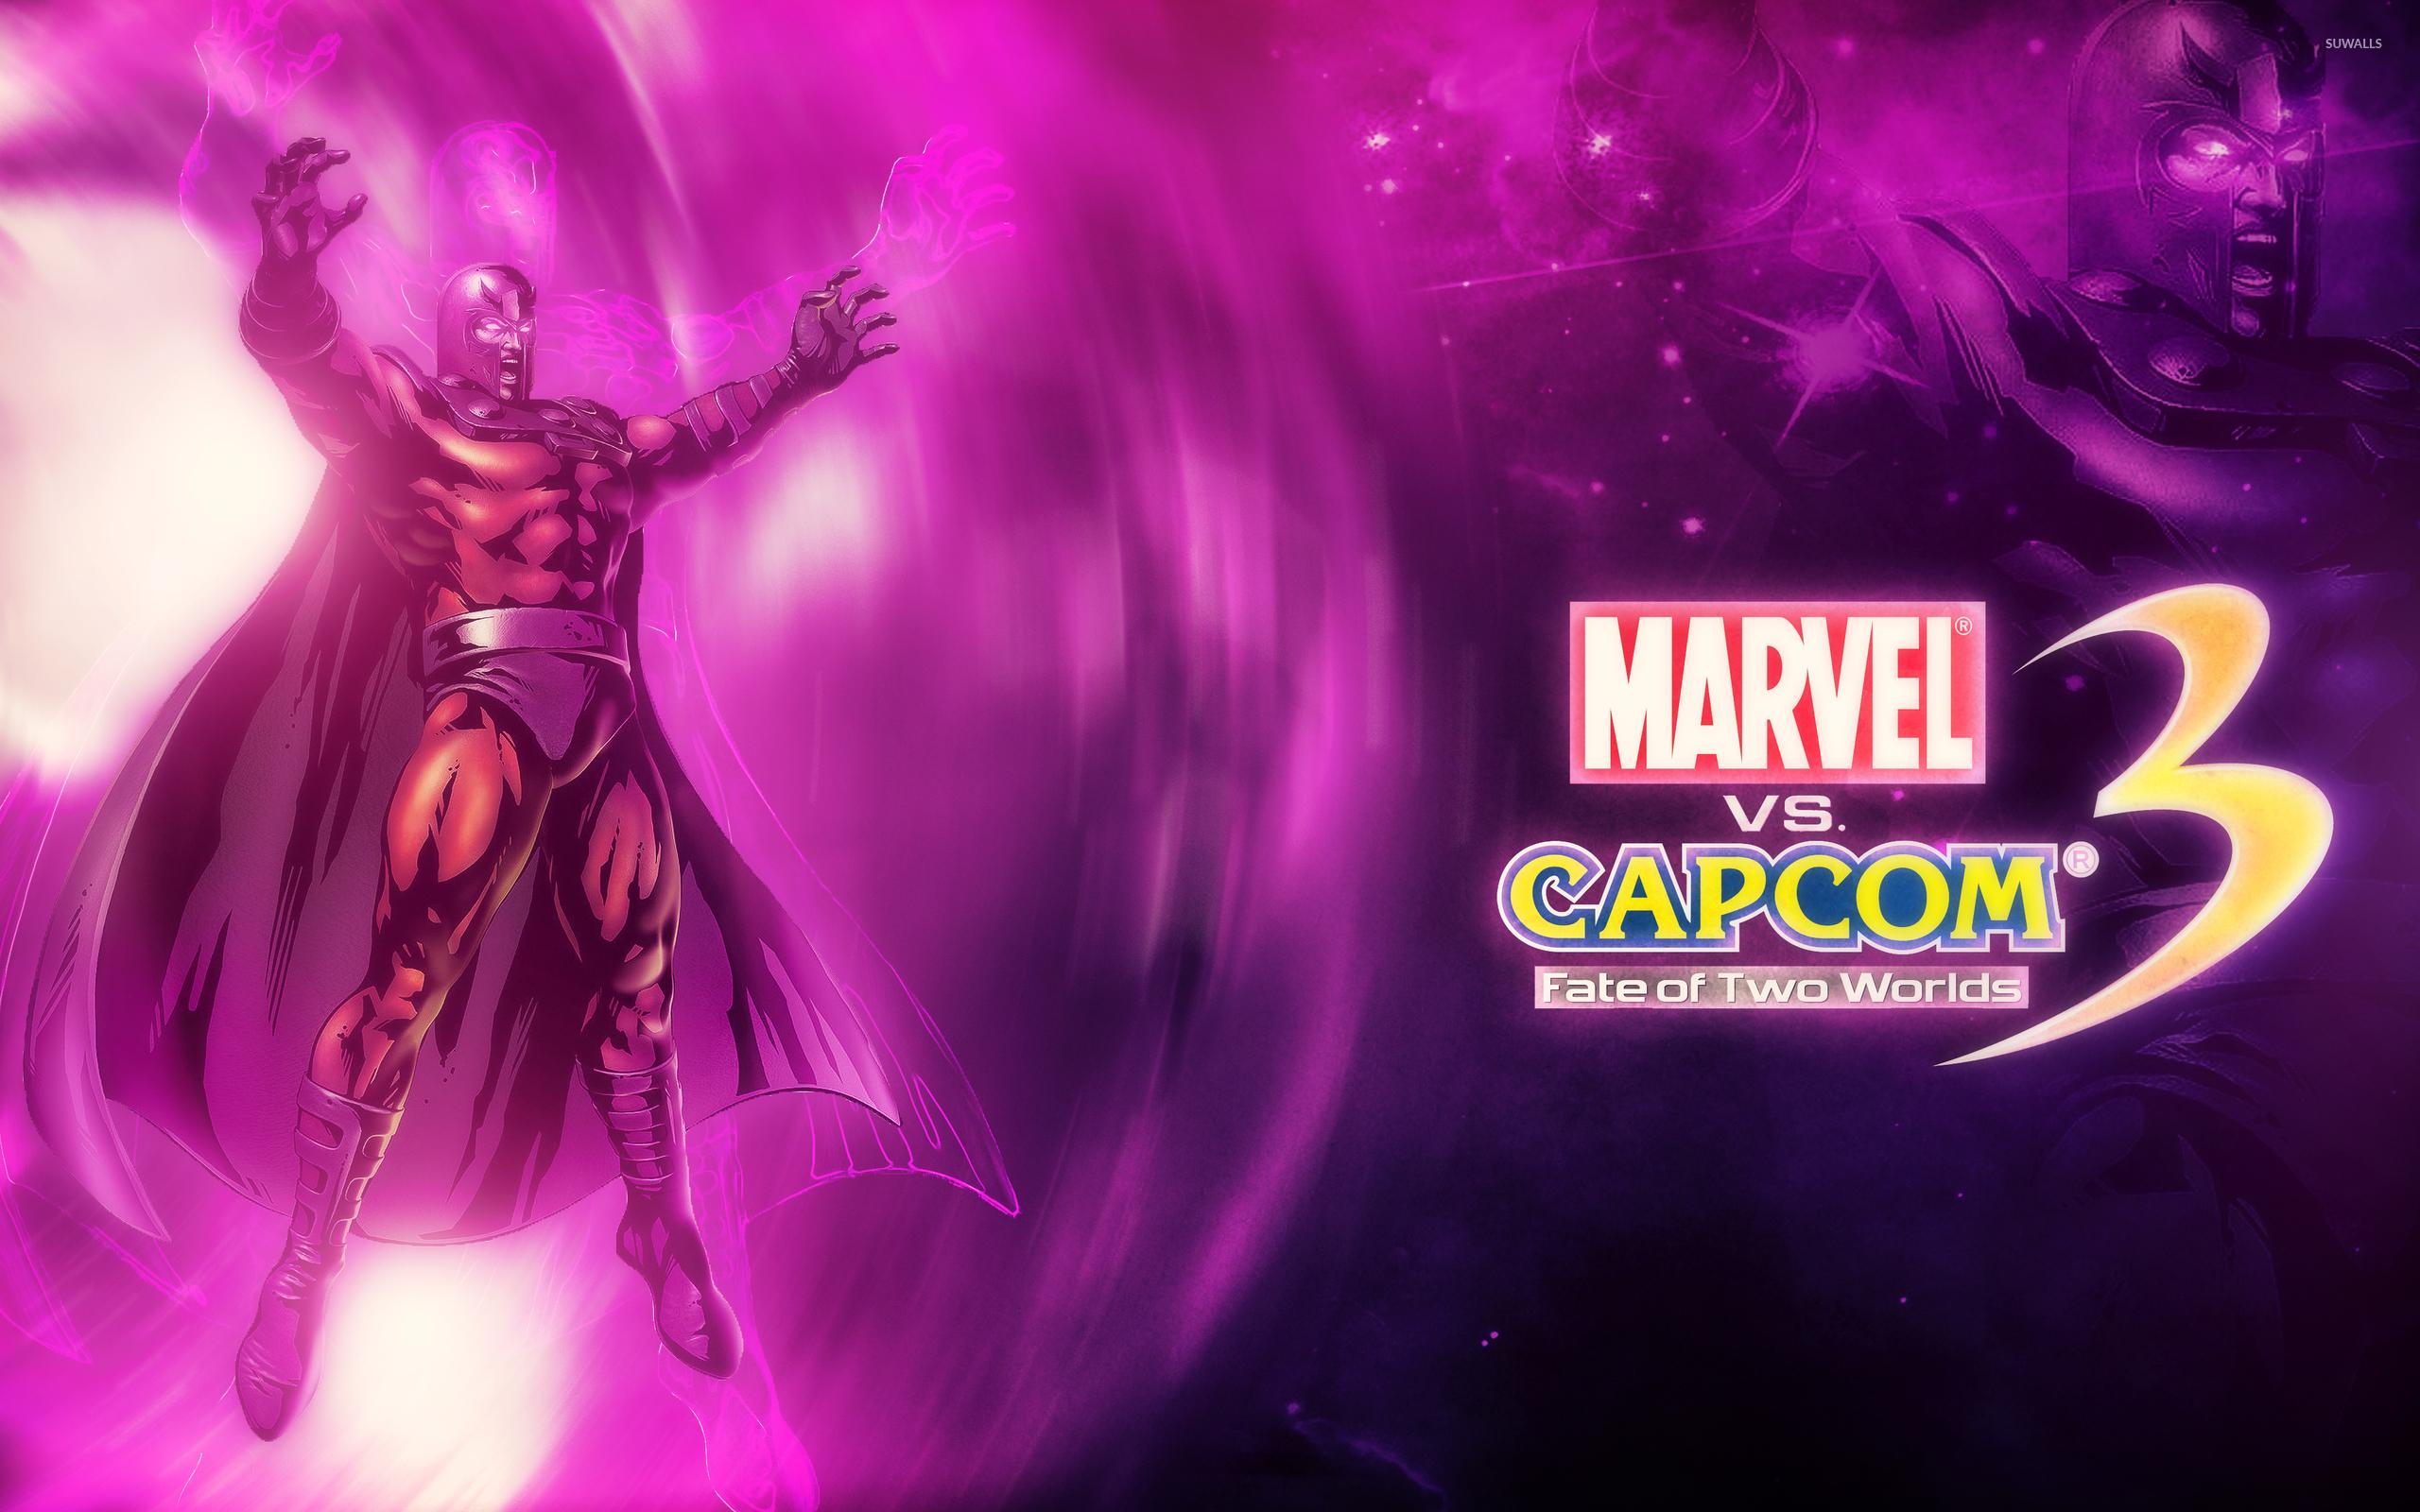 Marvel Vs Capcom 3 Magneto Wallpaper Game Wallpapers 2681